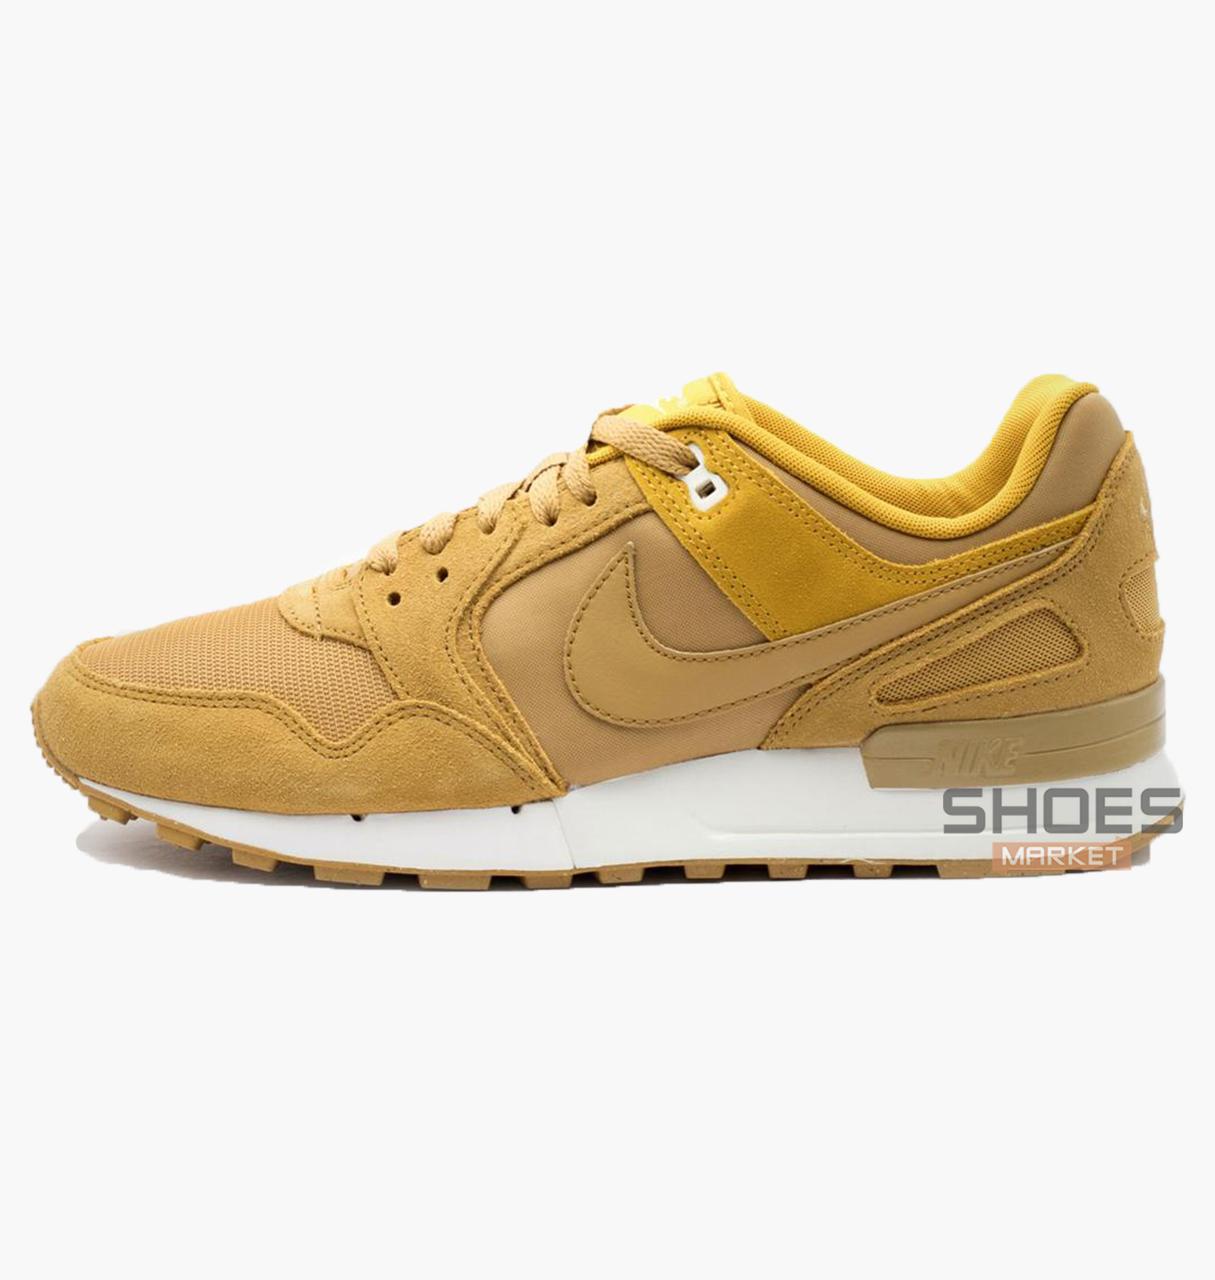 Мужские кроссовки Nike Air Pegasus '89 Orange 344082-700, оригинал